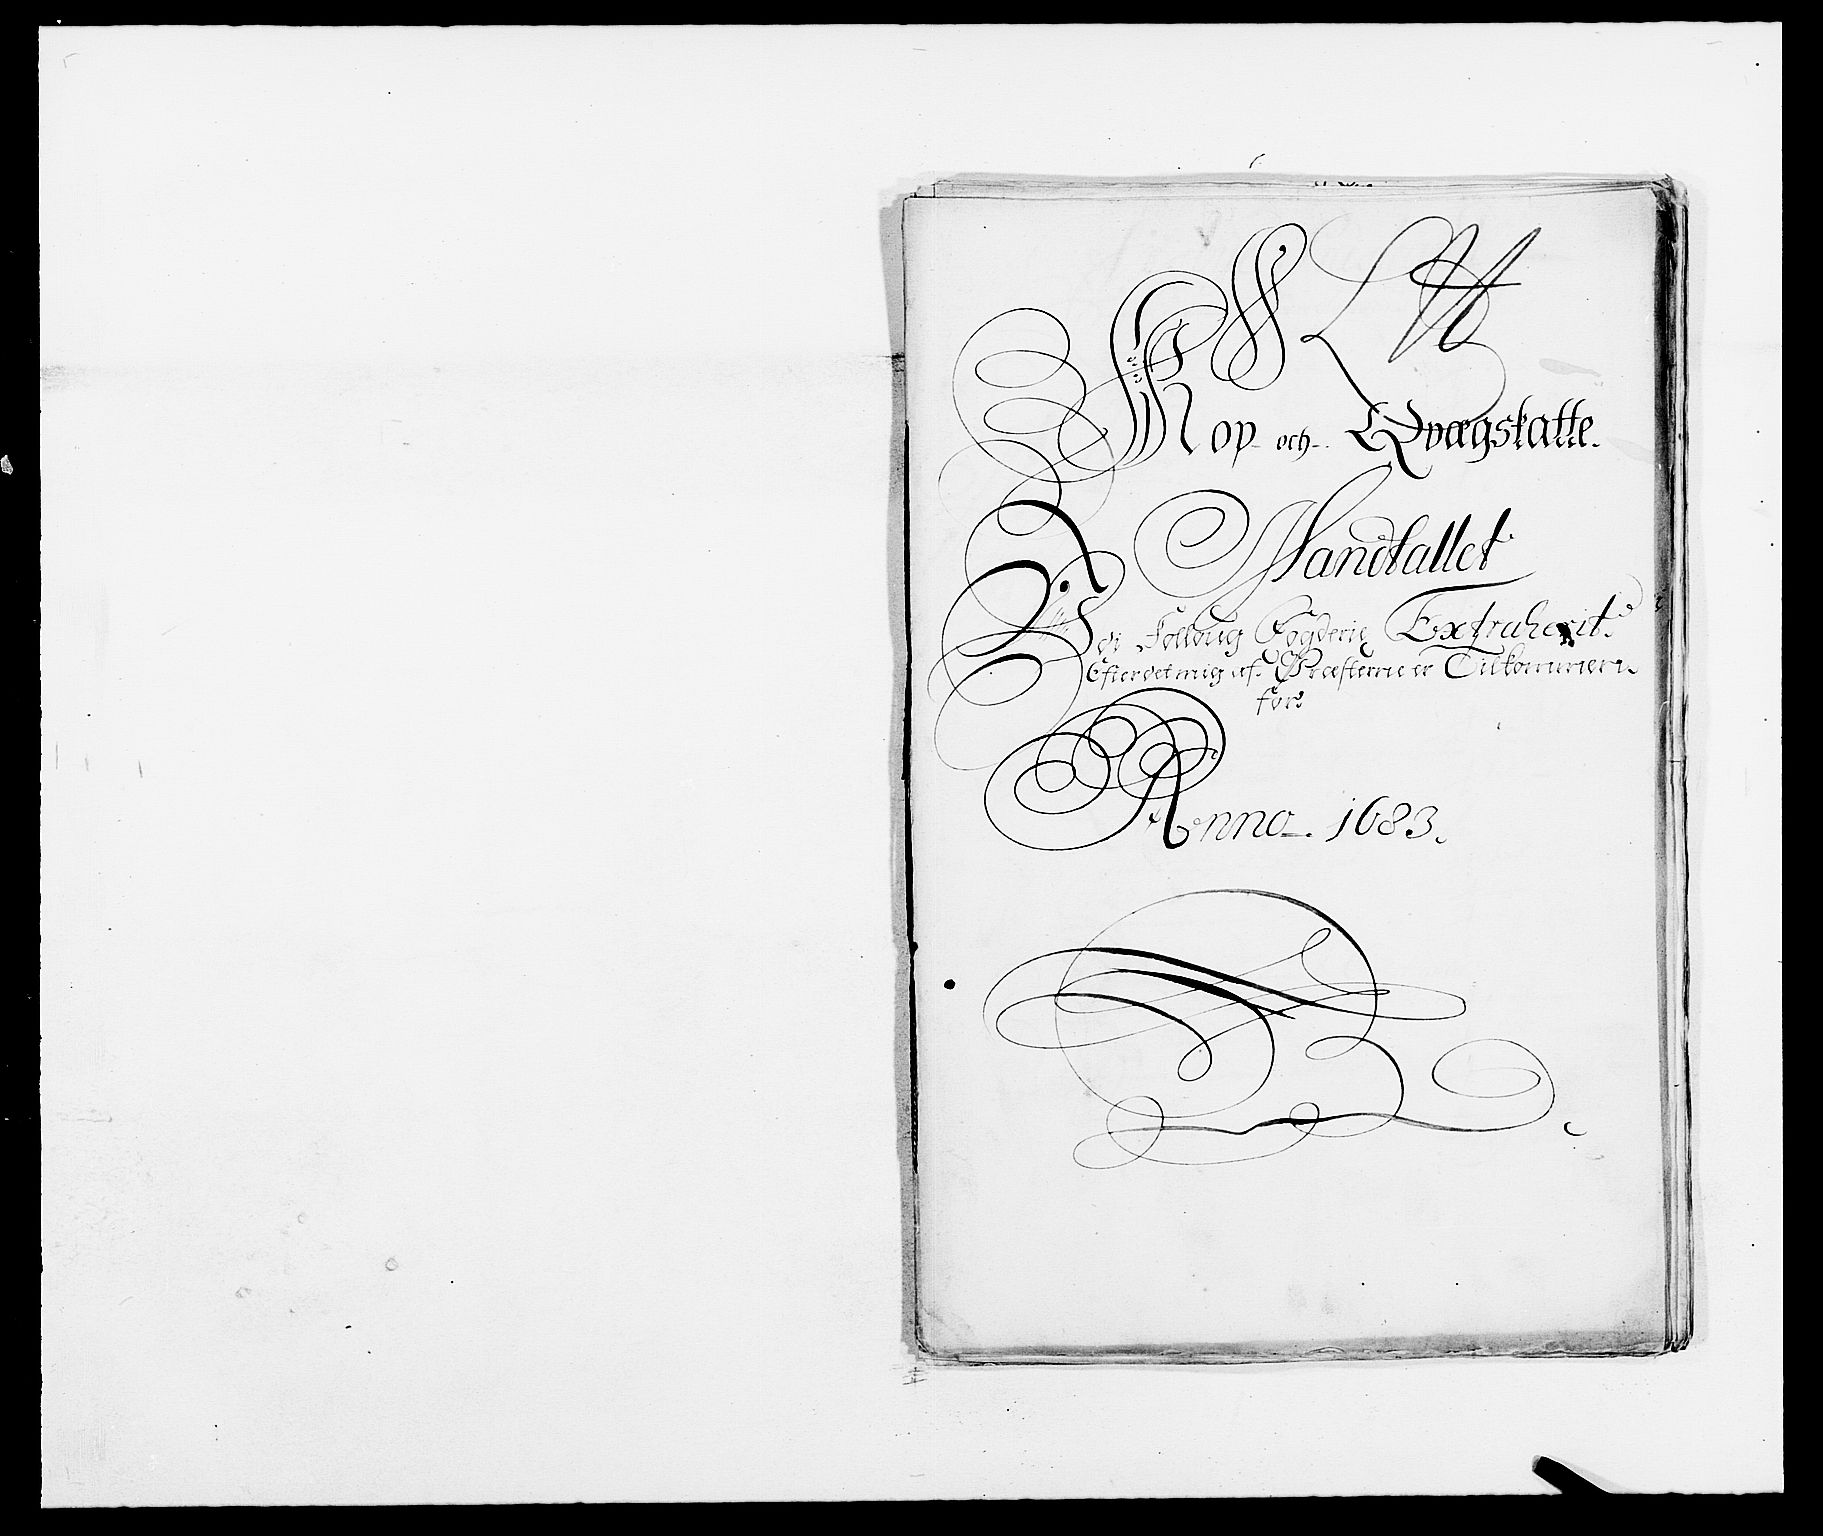 RA, Rentekammeret inntil 1814, Reviderte regnskaper, Fogderegnskap, R09/L0430: Fogderegnskap Follo, 1682-1683, s. 226